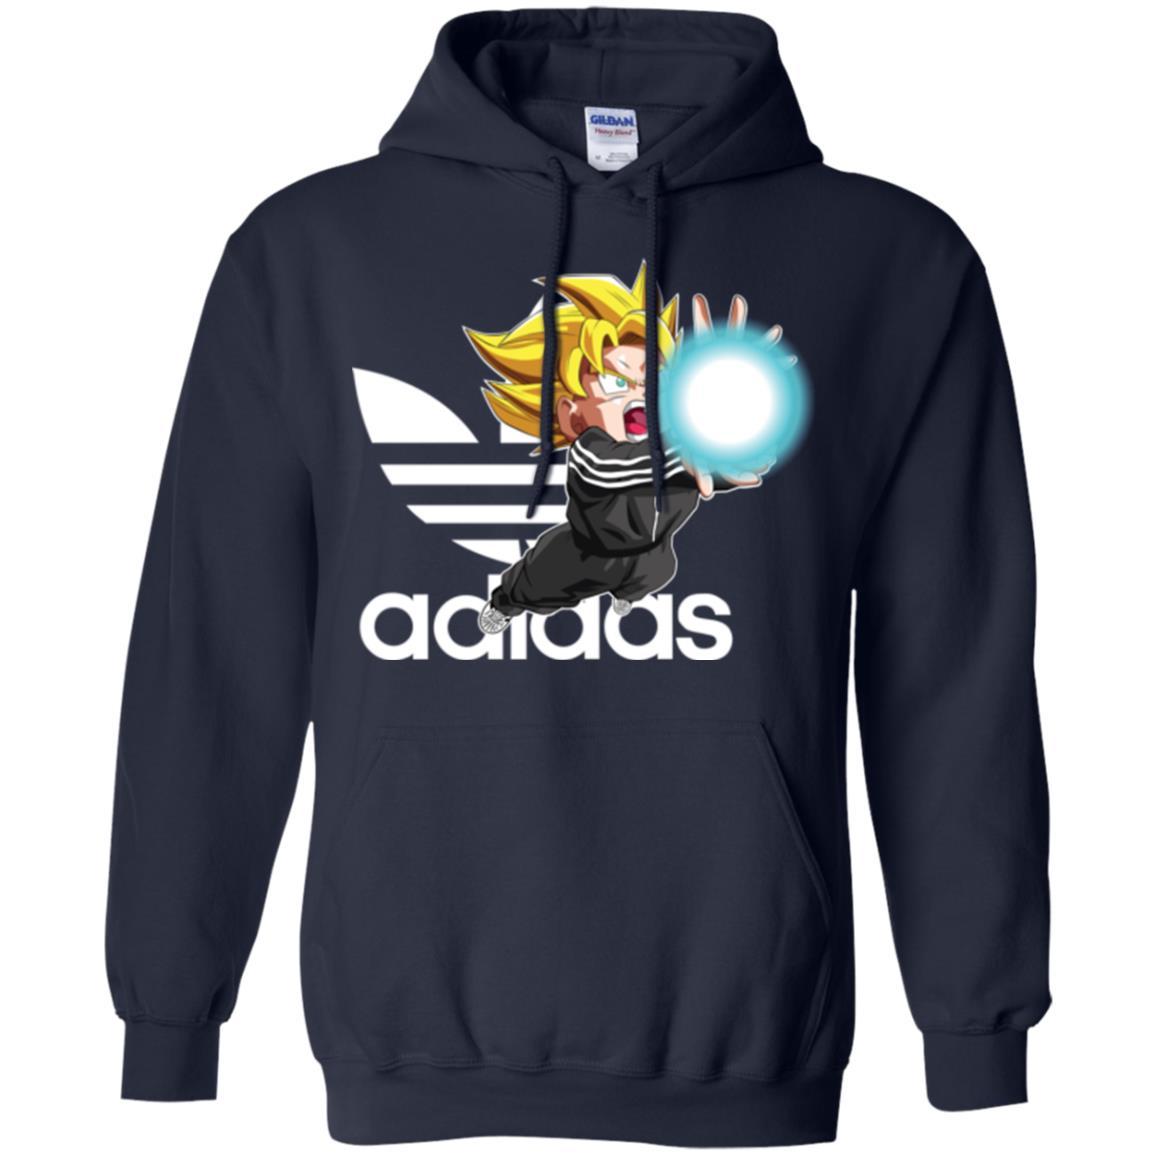 image 267px Goku Adidas Mashup T Shirt, Hoodies, Tank Top Available